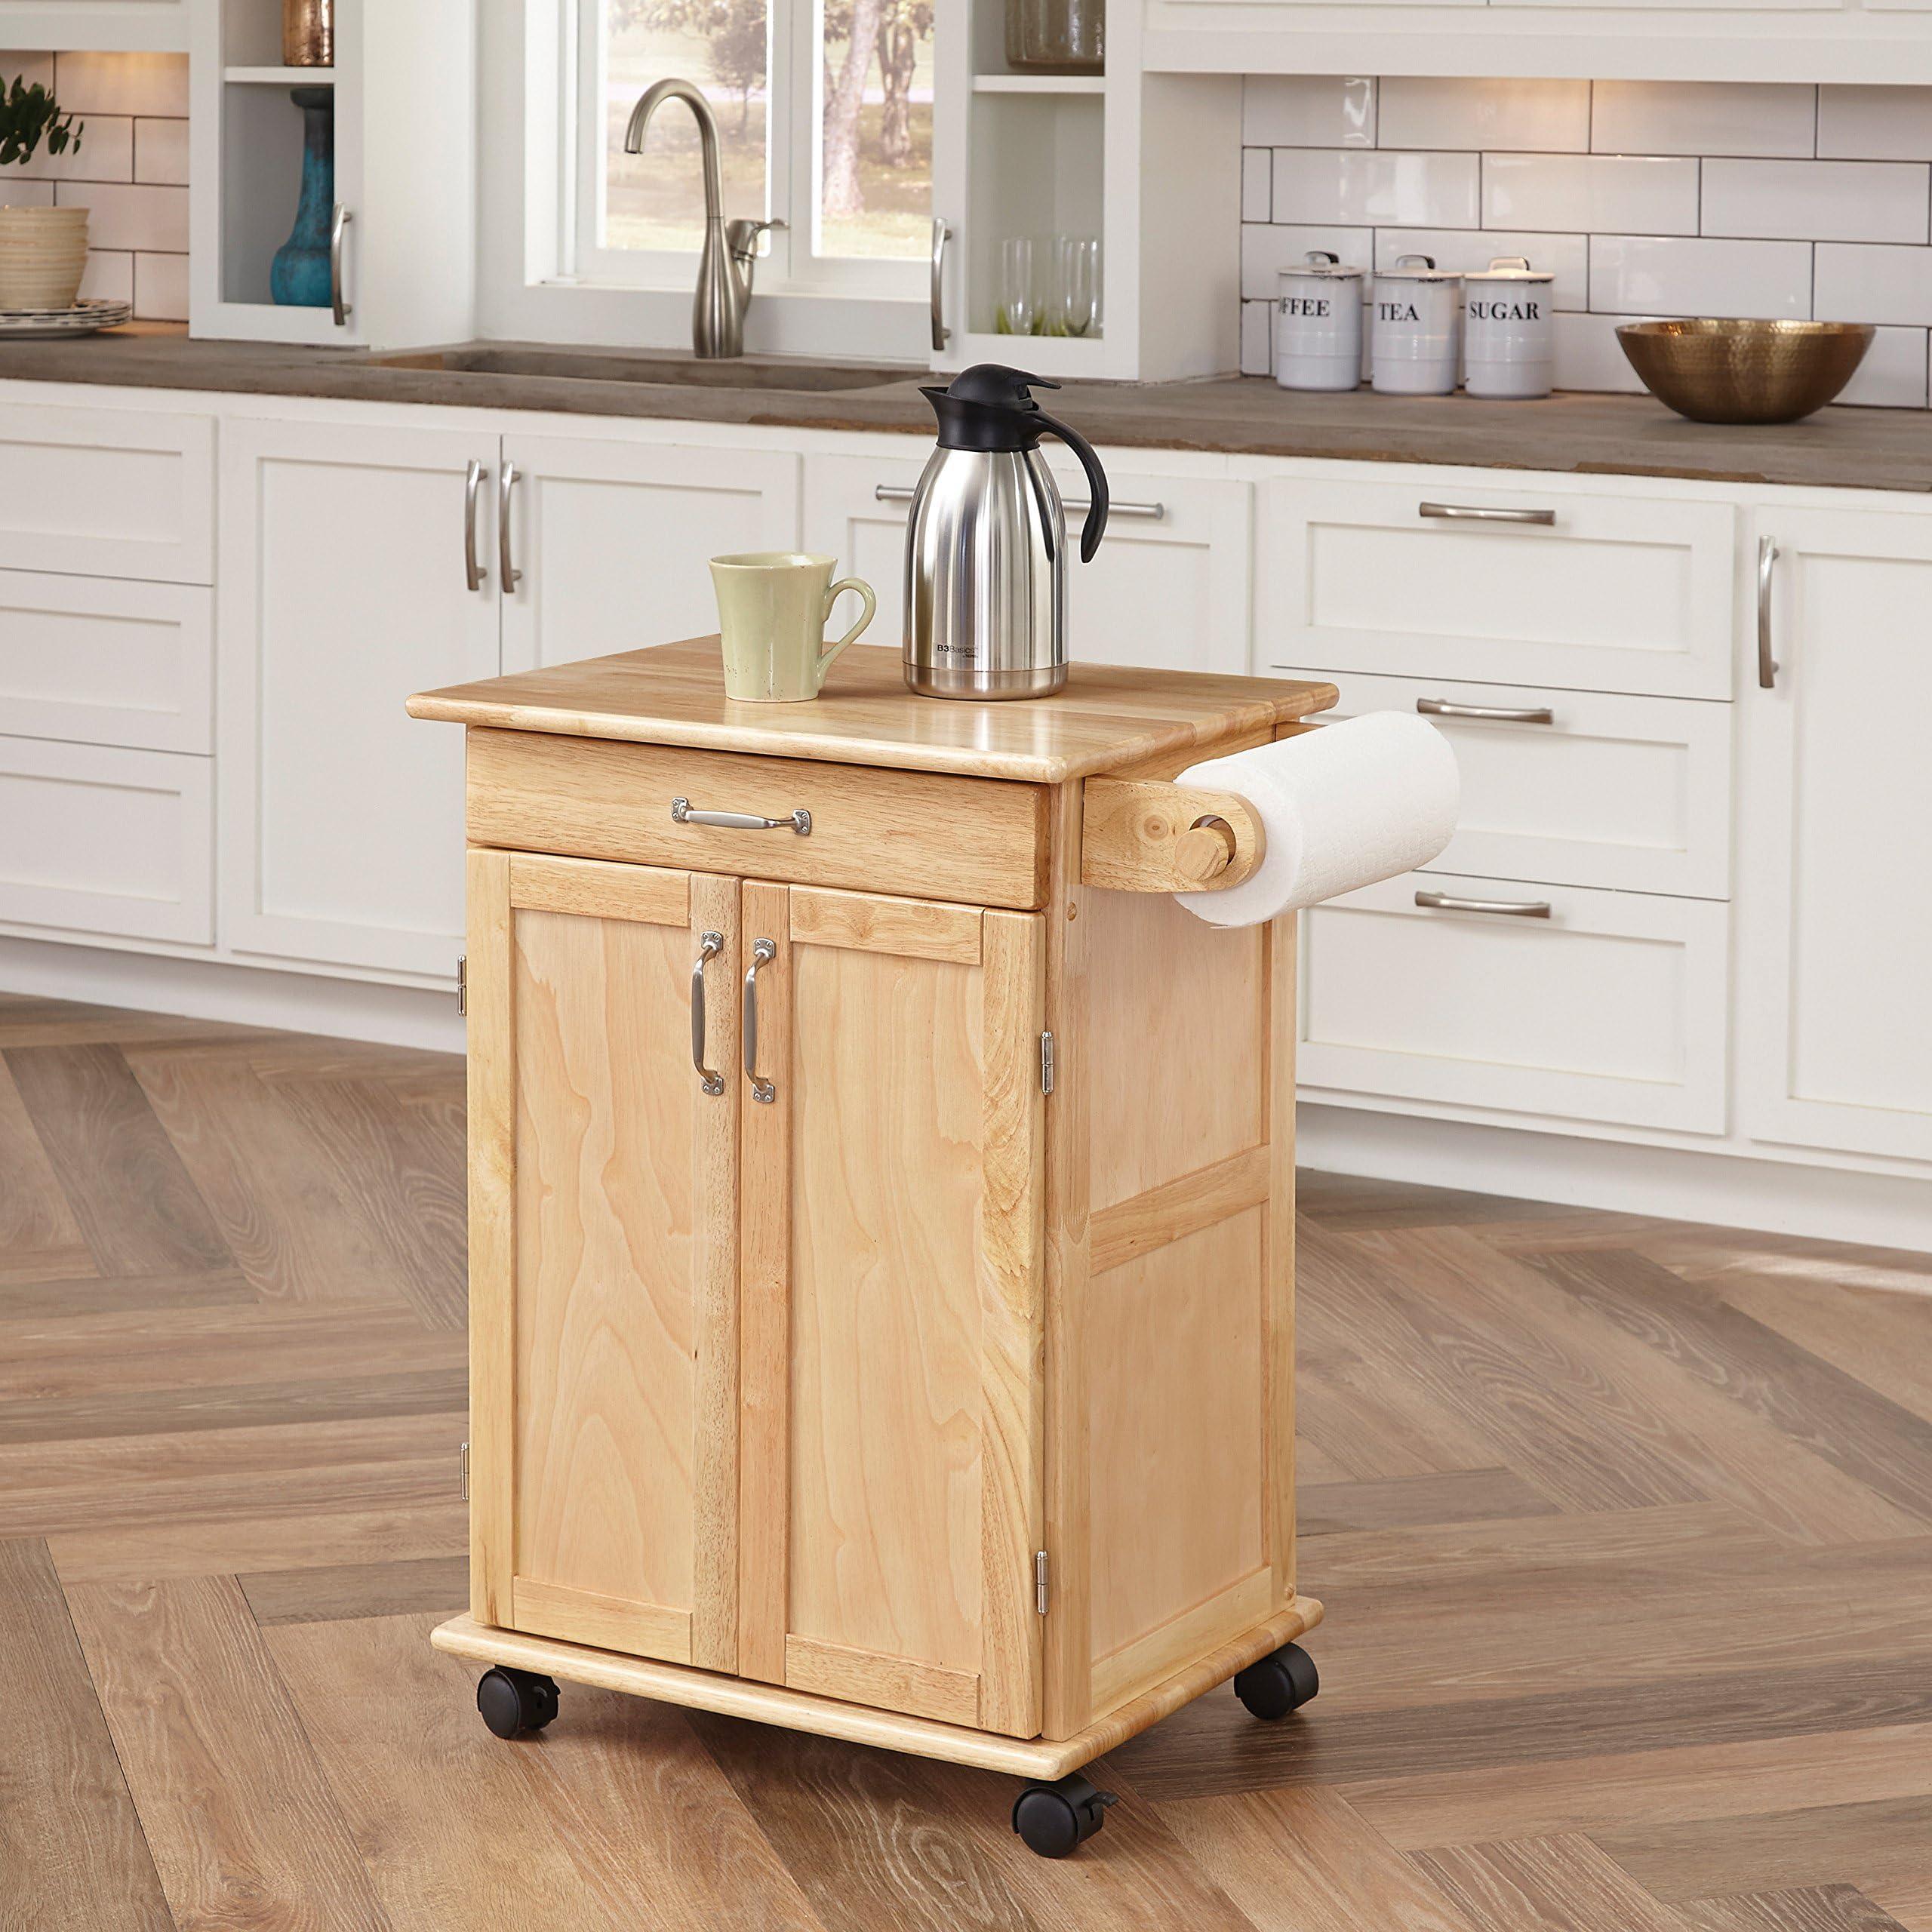 home styles 5040 95 paneled door kitchen cart natural finish kitchen islands  u0026 carts   amazon com  rh   amazon com